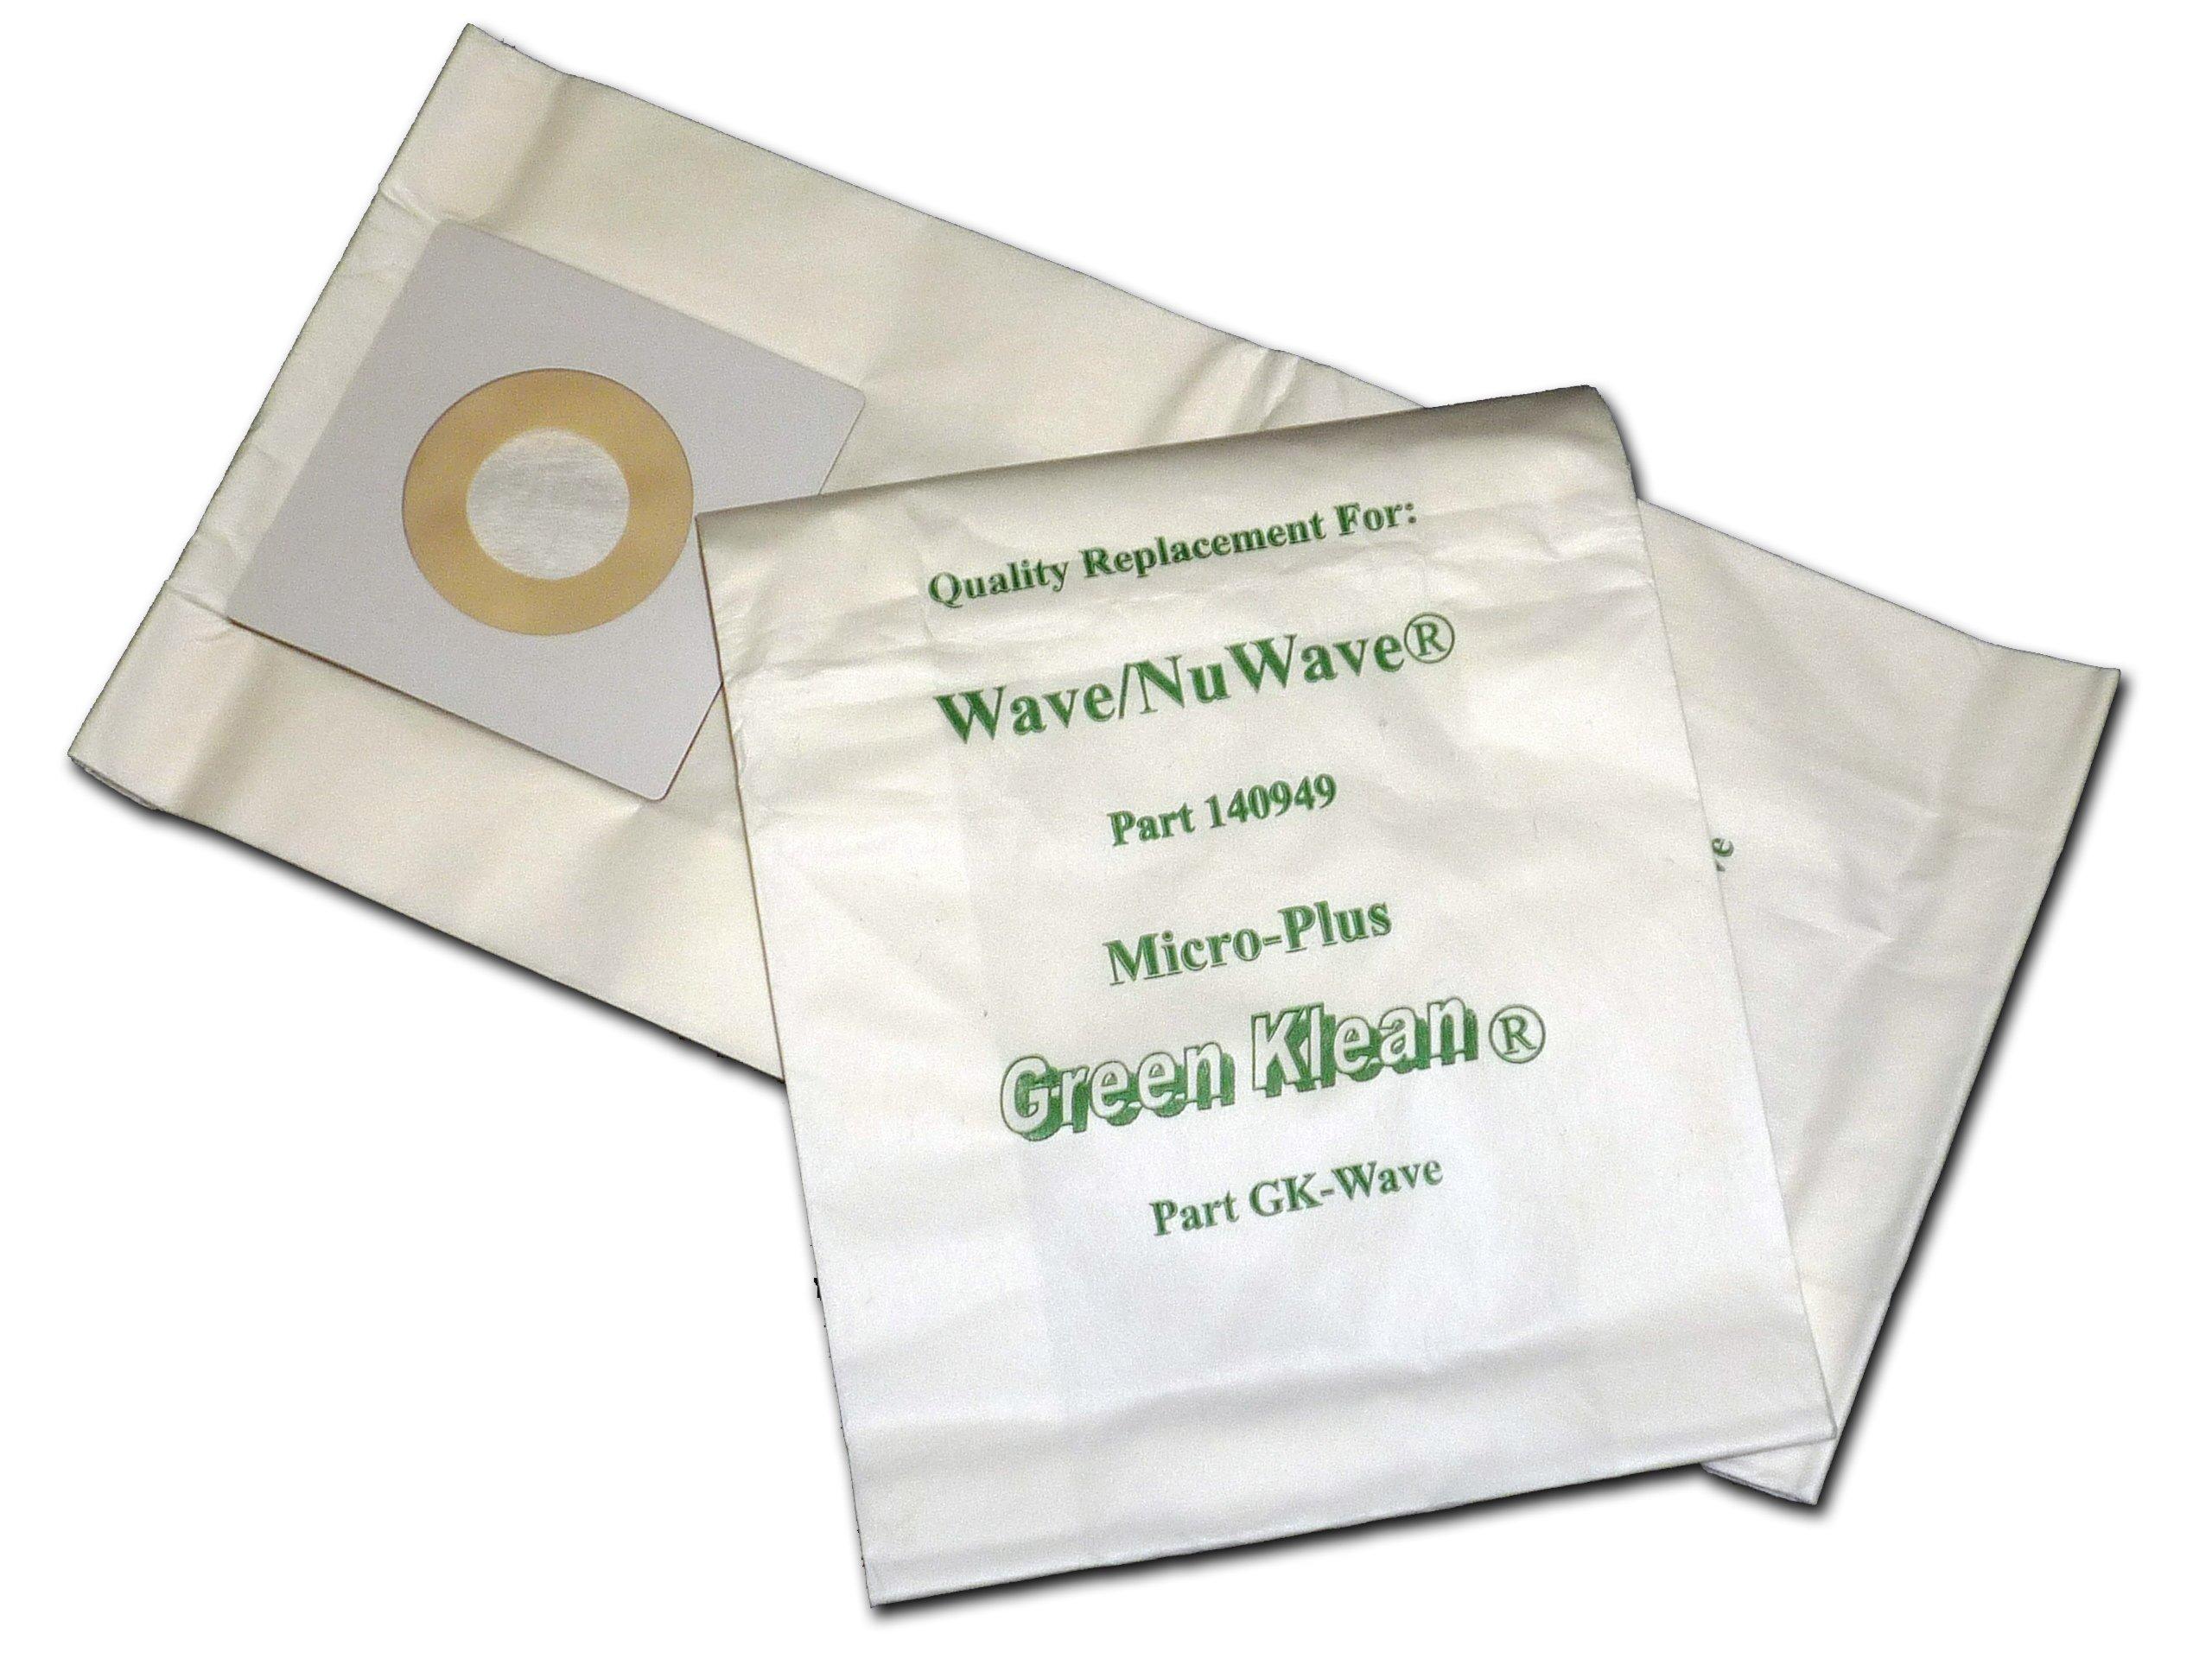 Green Klean GK-Wave Windsor NuWave, Wave and Ivacuum Replacement Vacuum Bags (Pack of 100)